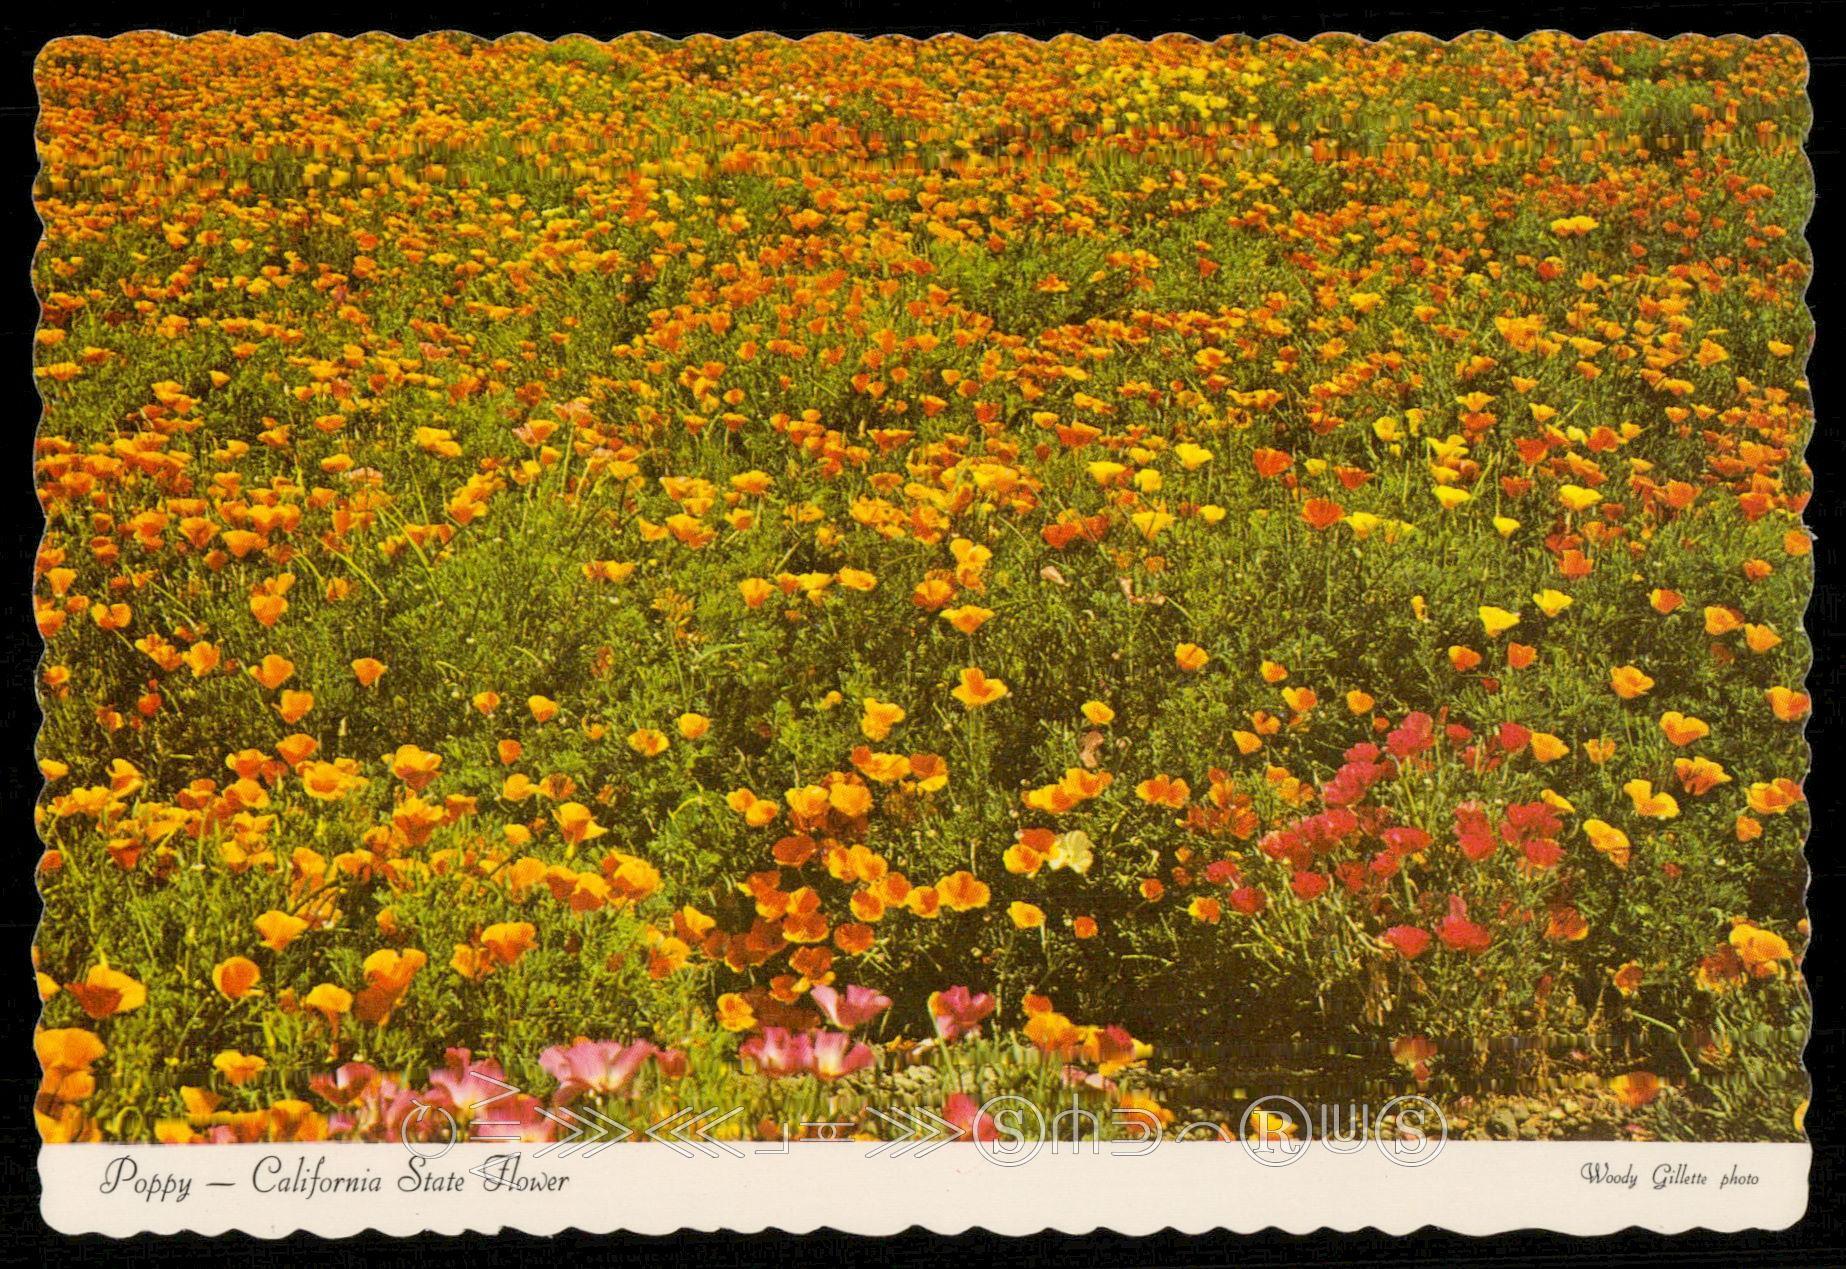 Poppy California State Flower Hippostcard